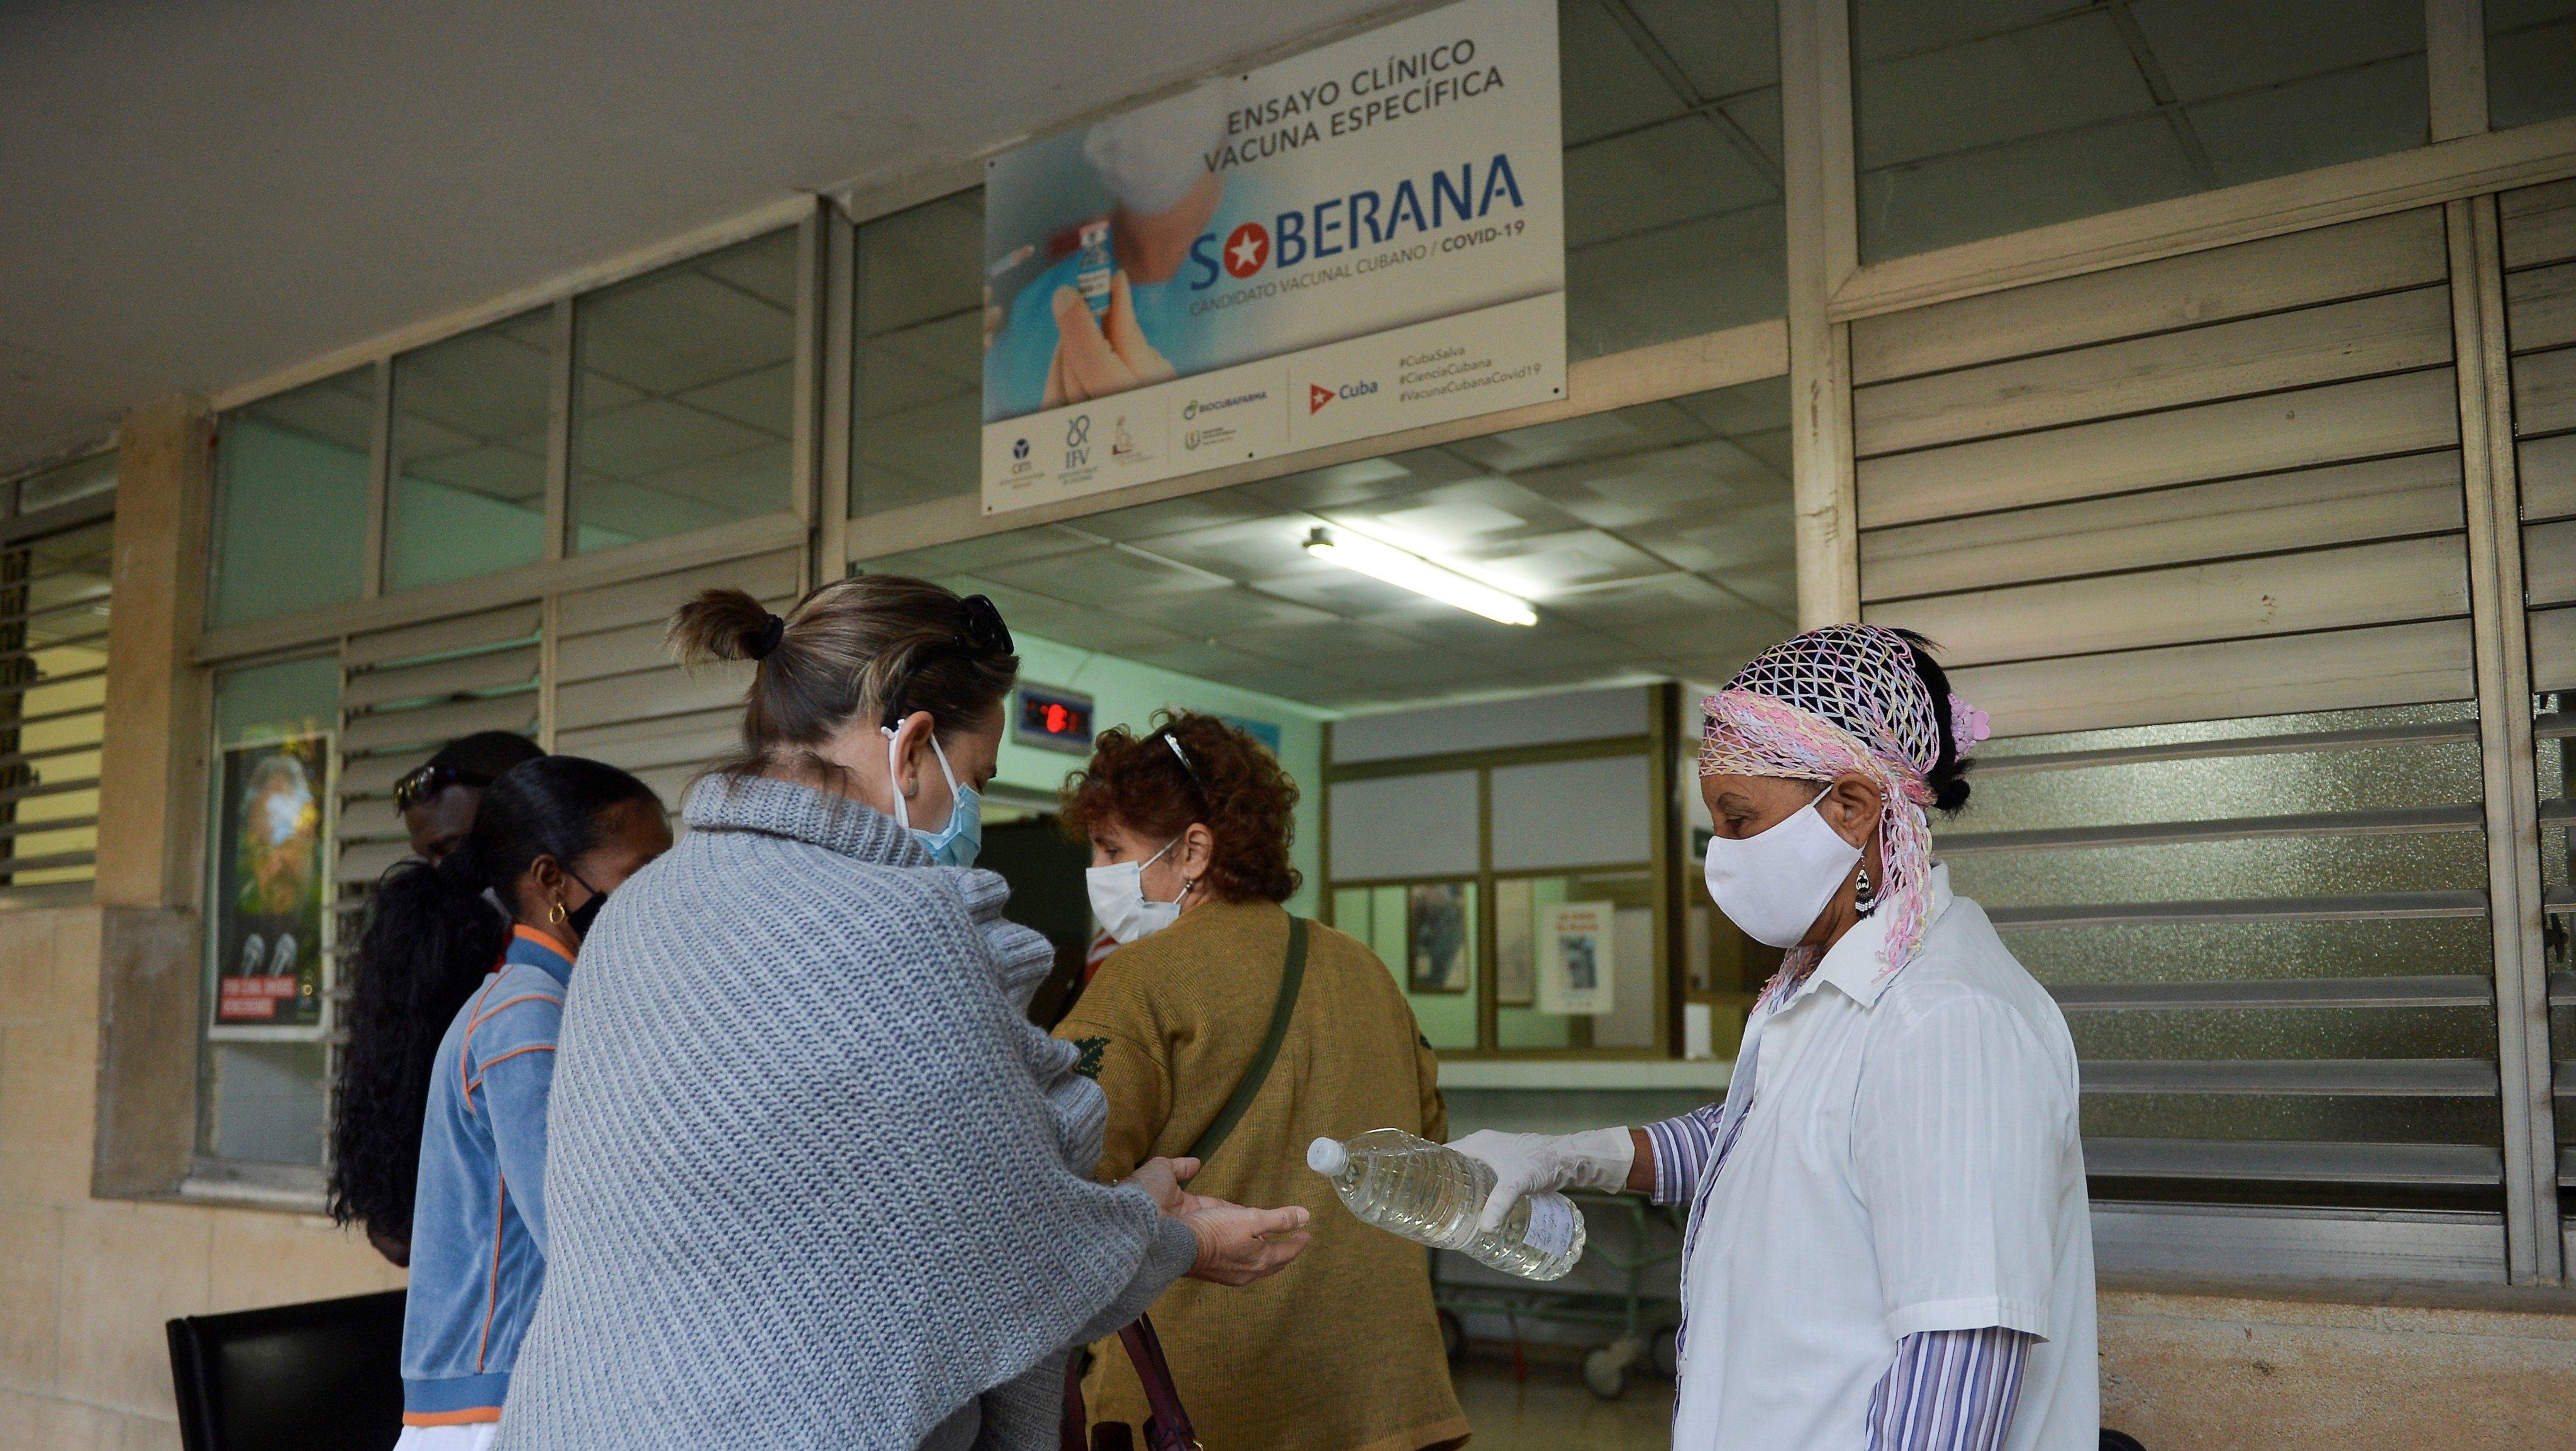 CUBA-HEALTH-VIRUS-VACCINE